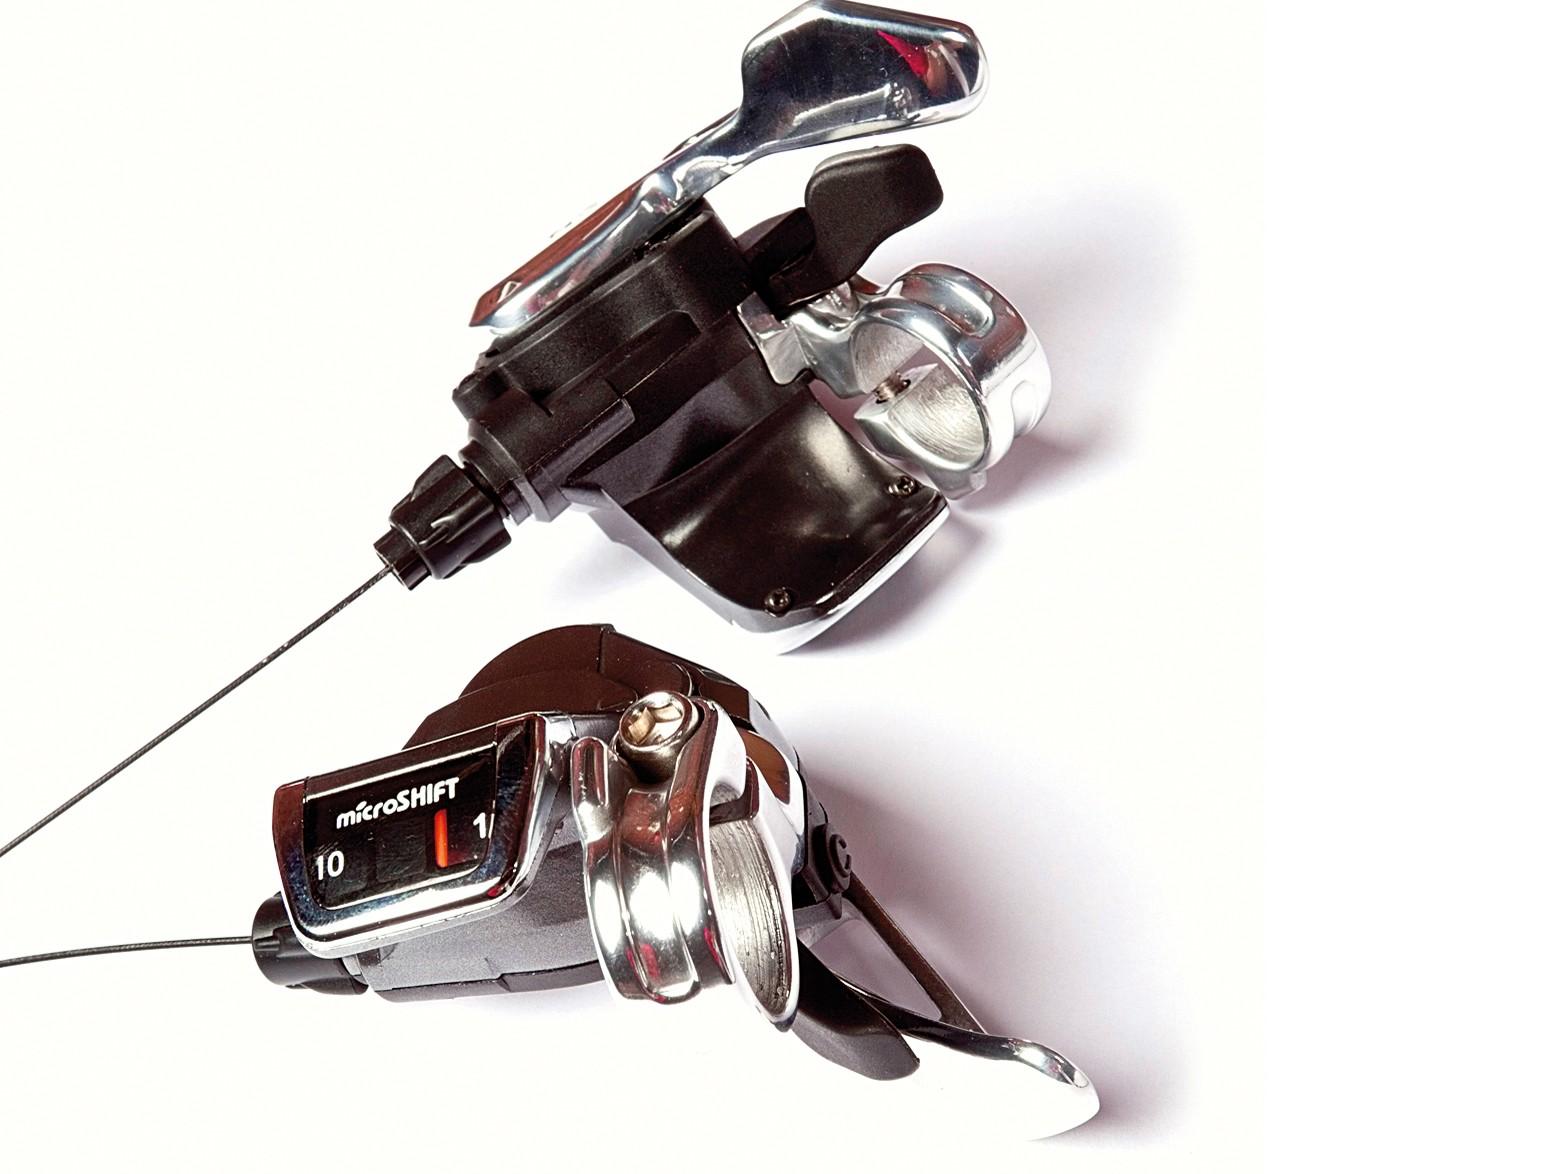 Microshift TS83-10 shifters